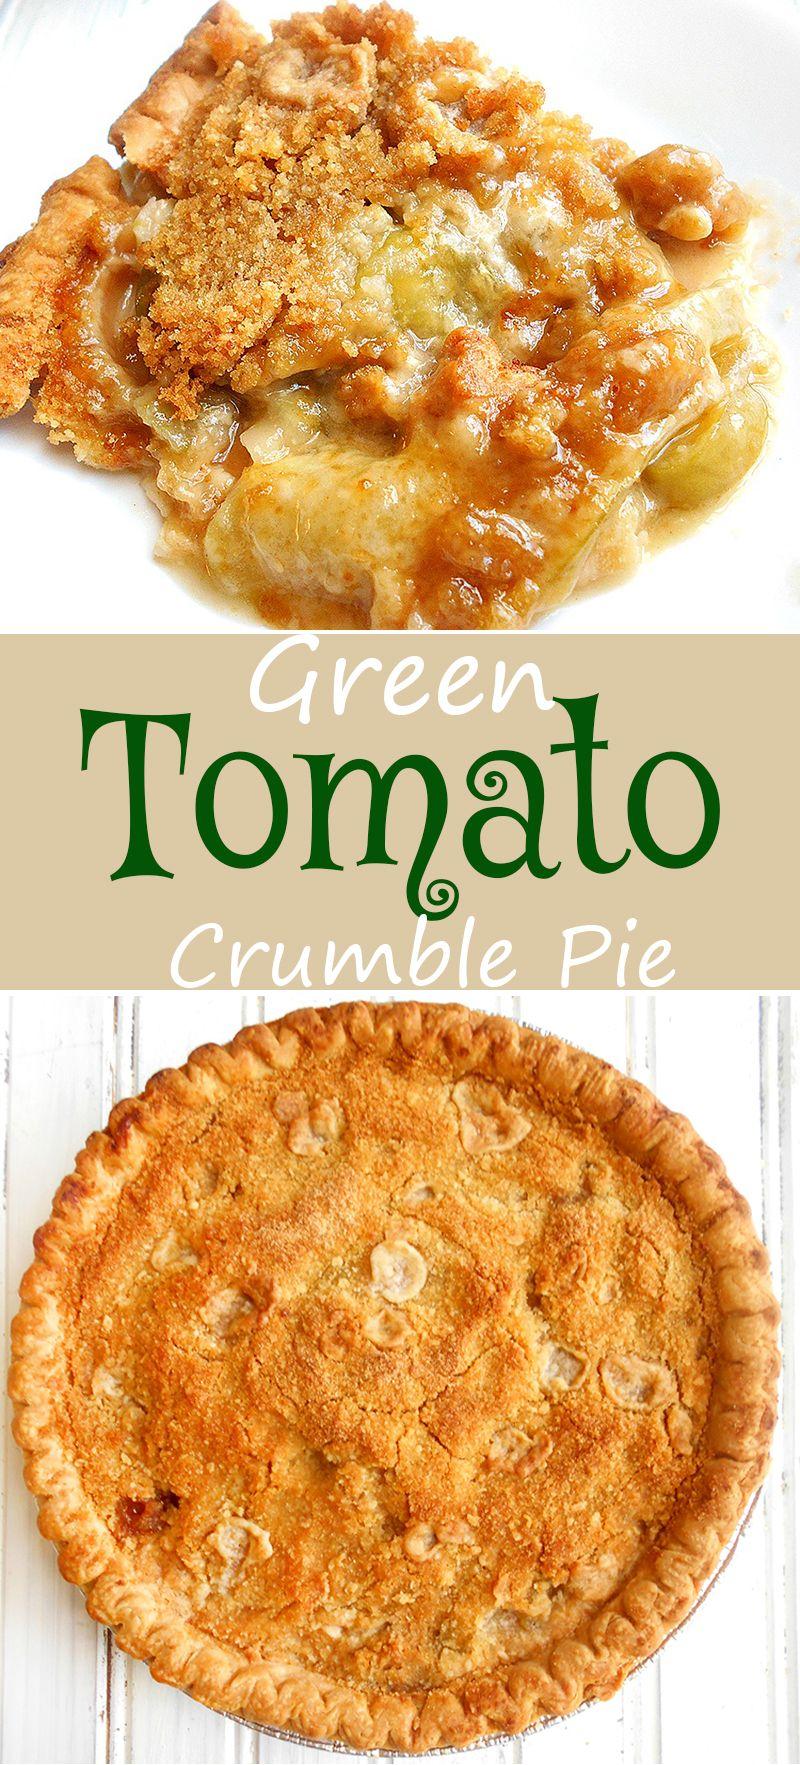 Green Tomato Crumble Pie is part of Tomato recipes - Simple green tomato crumble pie